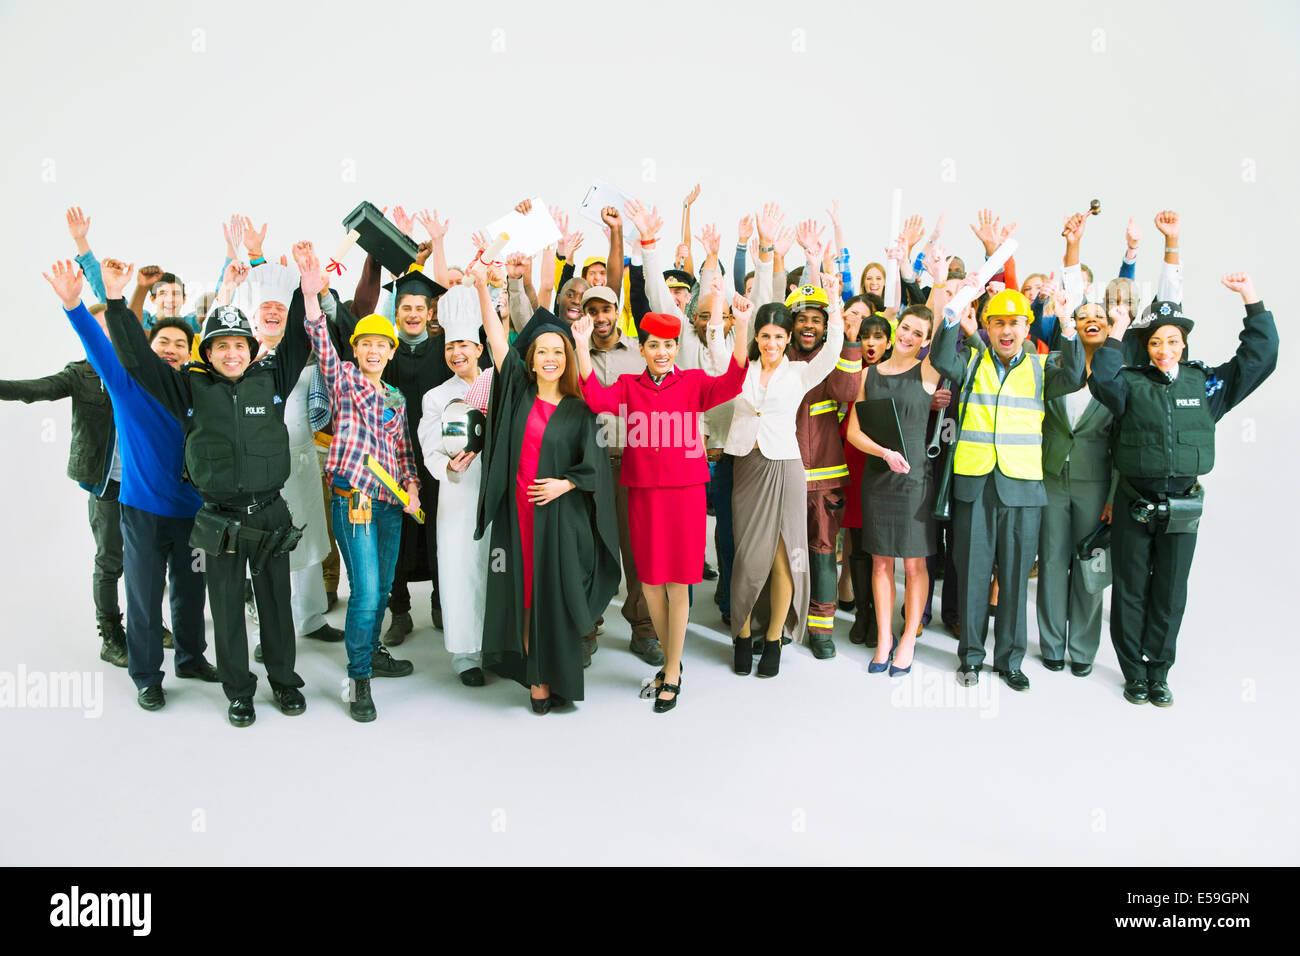 Retrato de diversa multitud Imagen De Stock